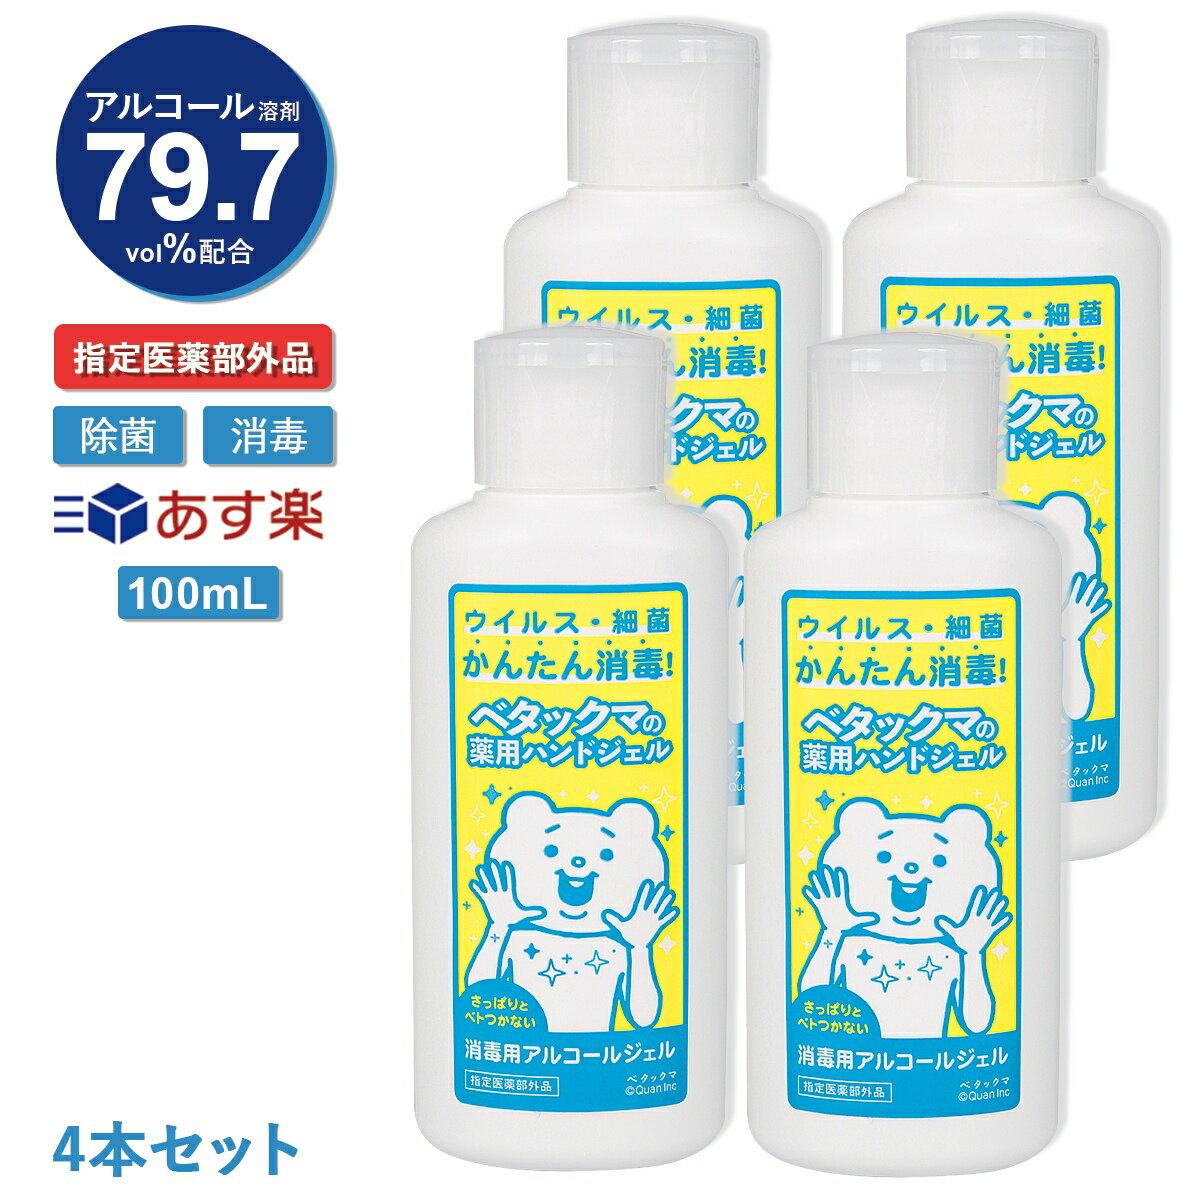 洗剤・柔軟剤・クリーナー, 除菌剤  100mL 79.7vol 4